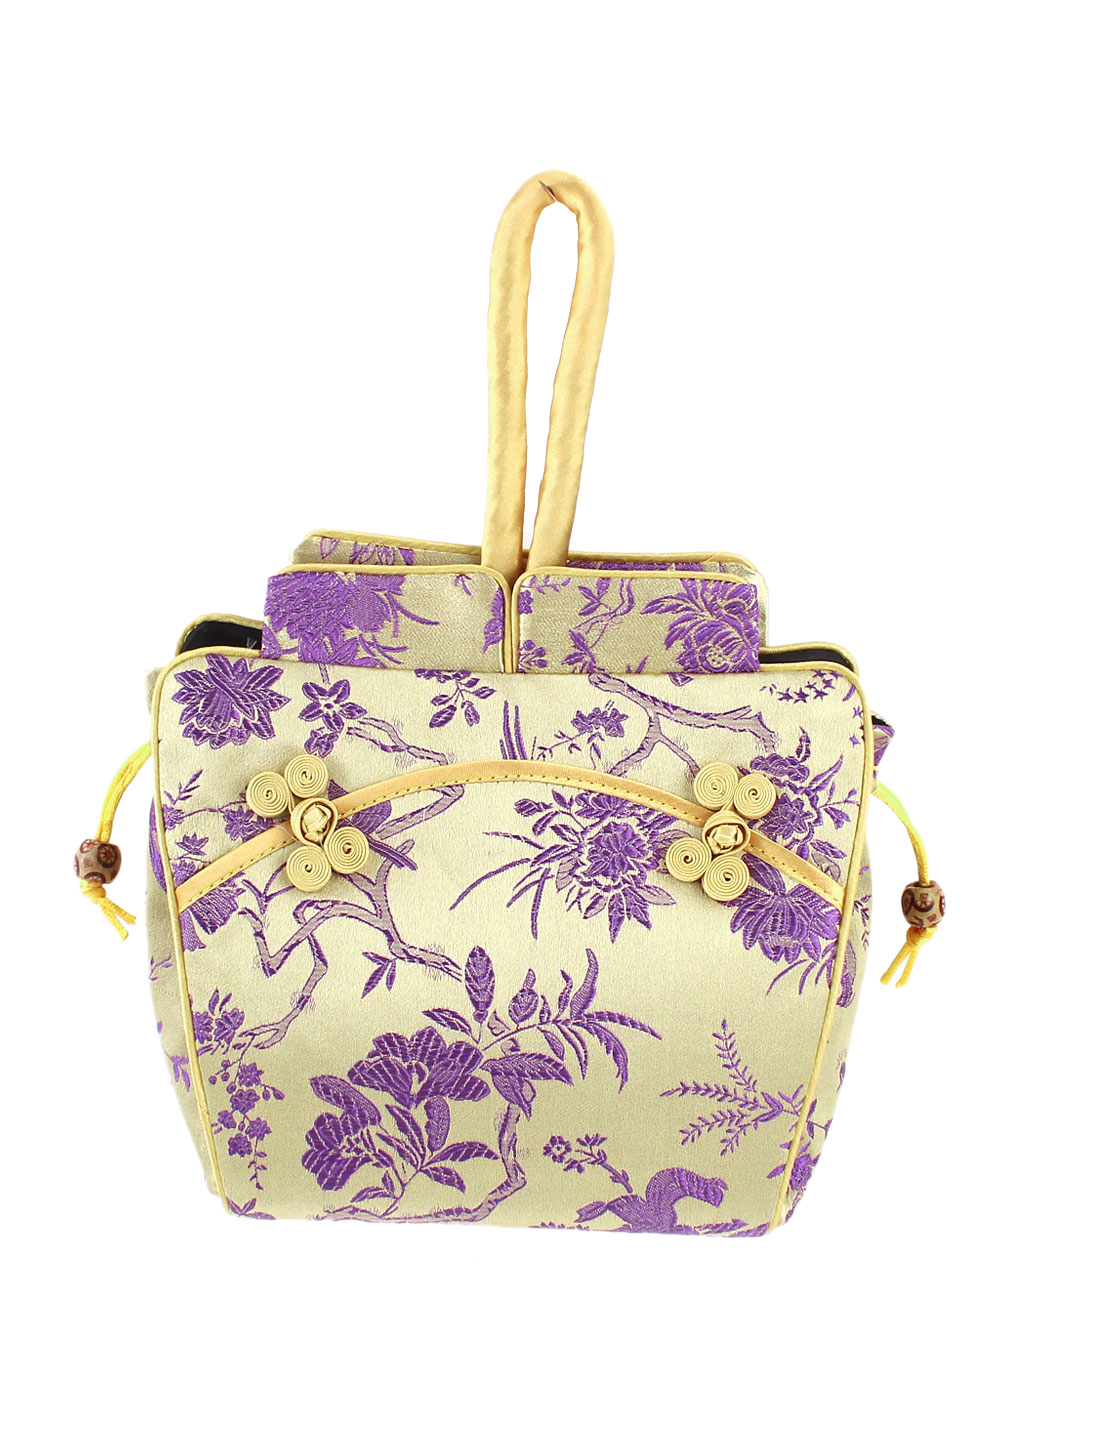 Women Brocade Cheongsam Design Embroidery Flower Pattern Drawstring Closure Handbag Beige Purple